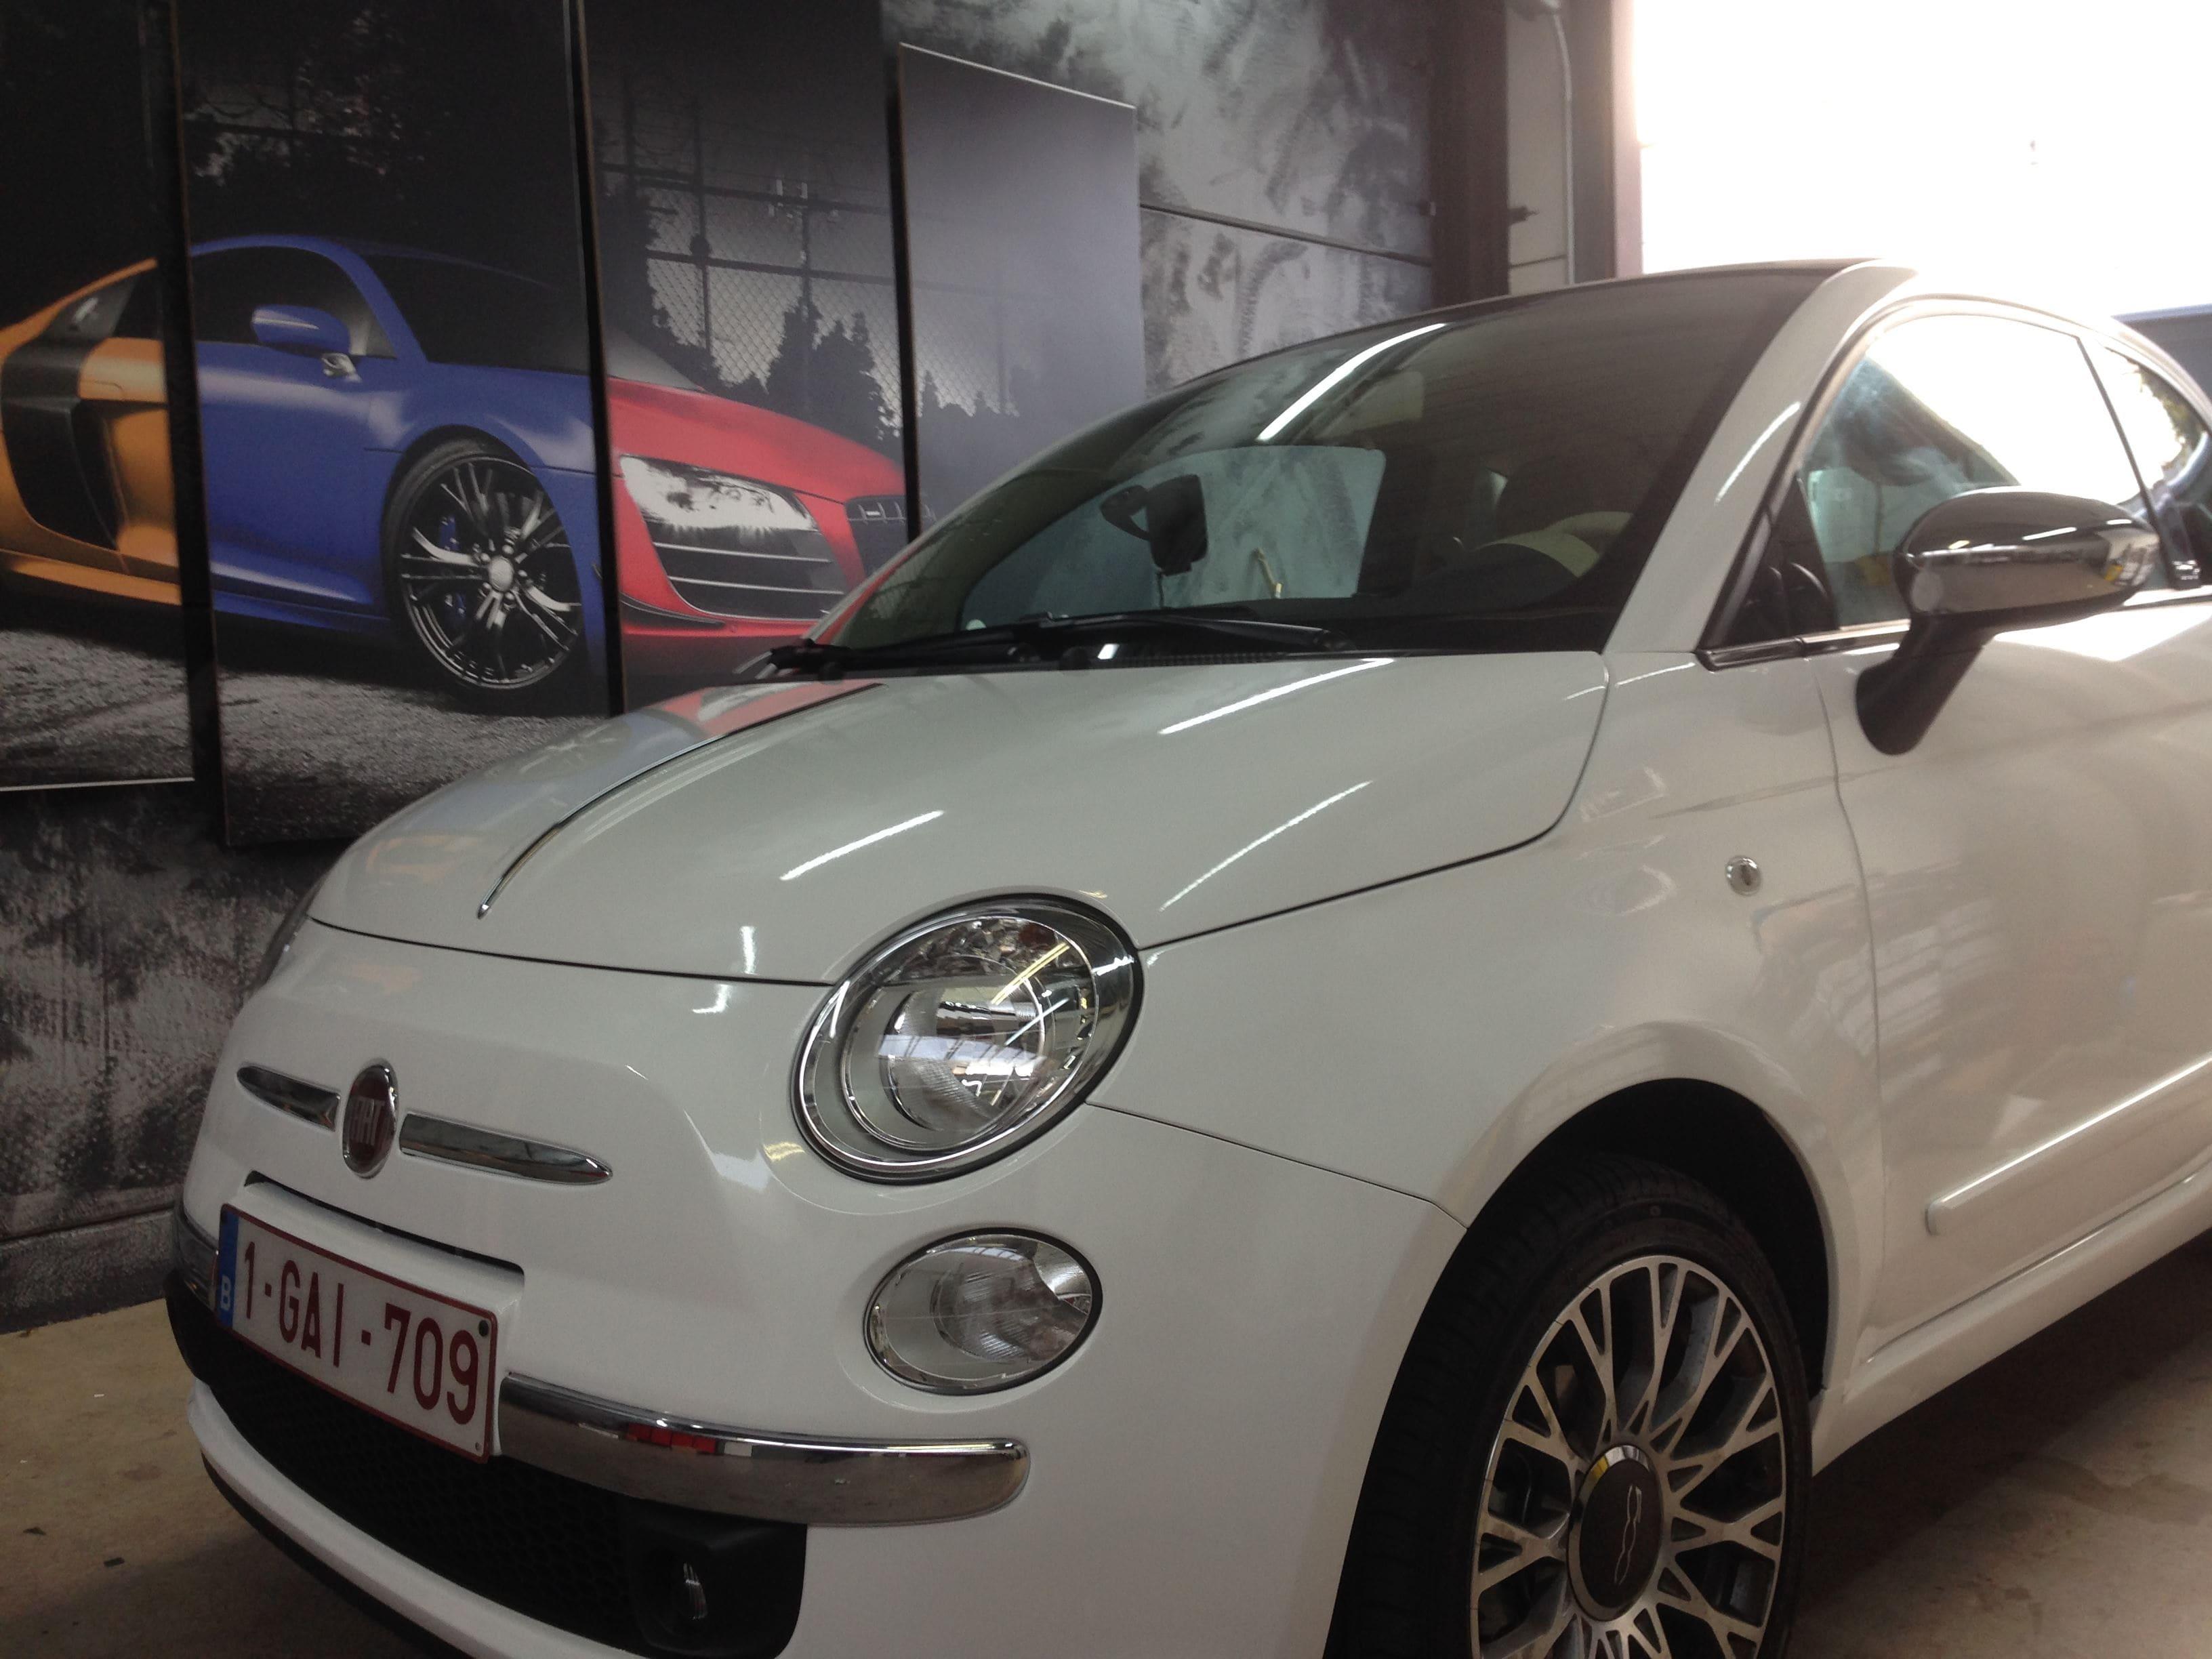 Fiat 500 met Glossy White Wrap, Carwrapping door Wrapmyride.nu Foto-nr:5727, ©2020